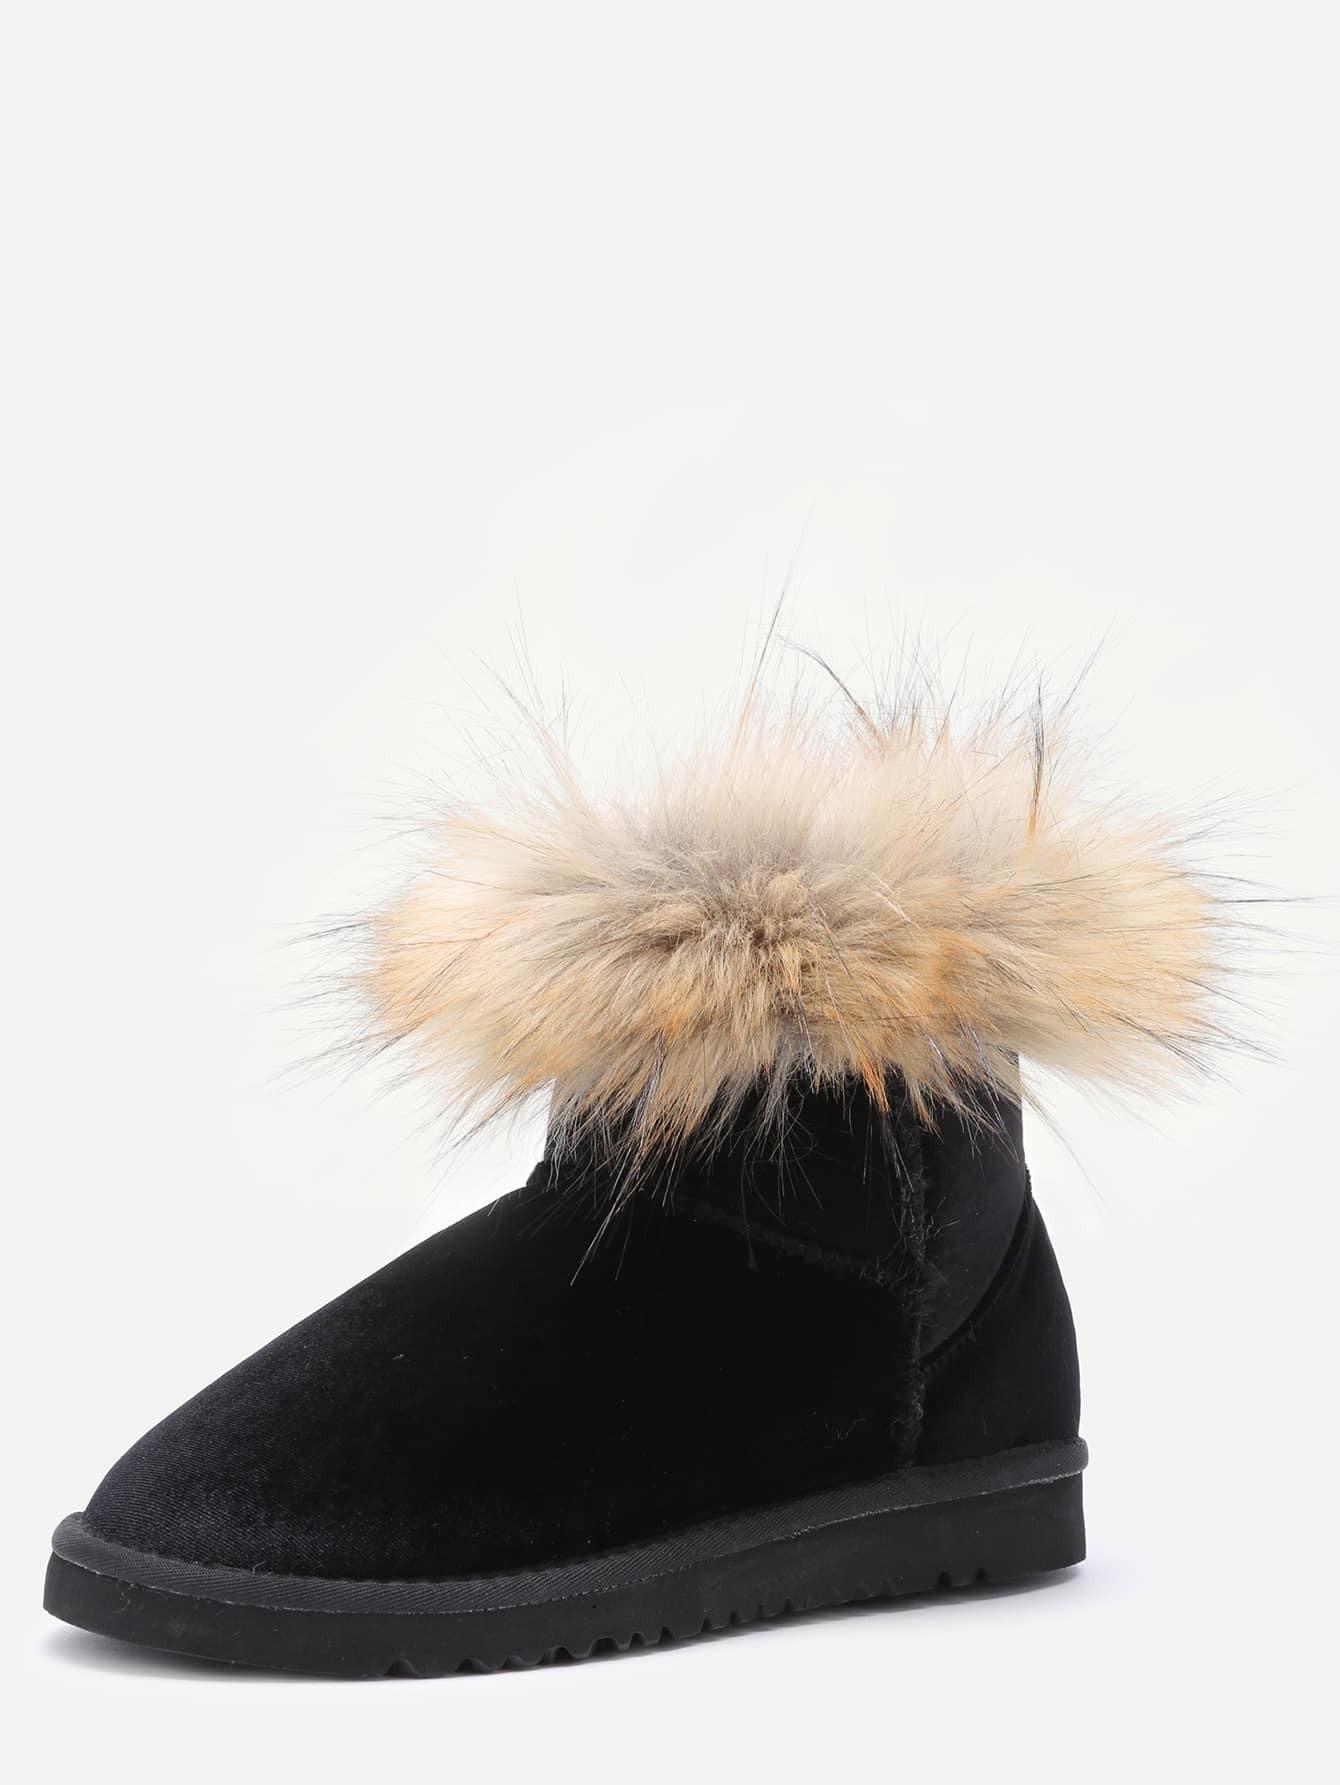 bottines de neige en velvet avec fourrure noir. Black Bedroom Furniture Sets. Home Design Ideas